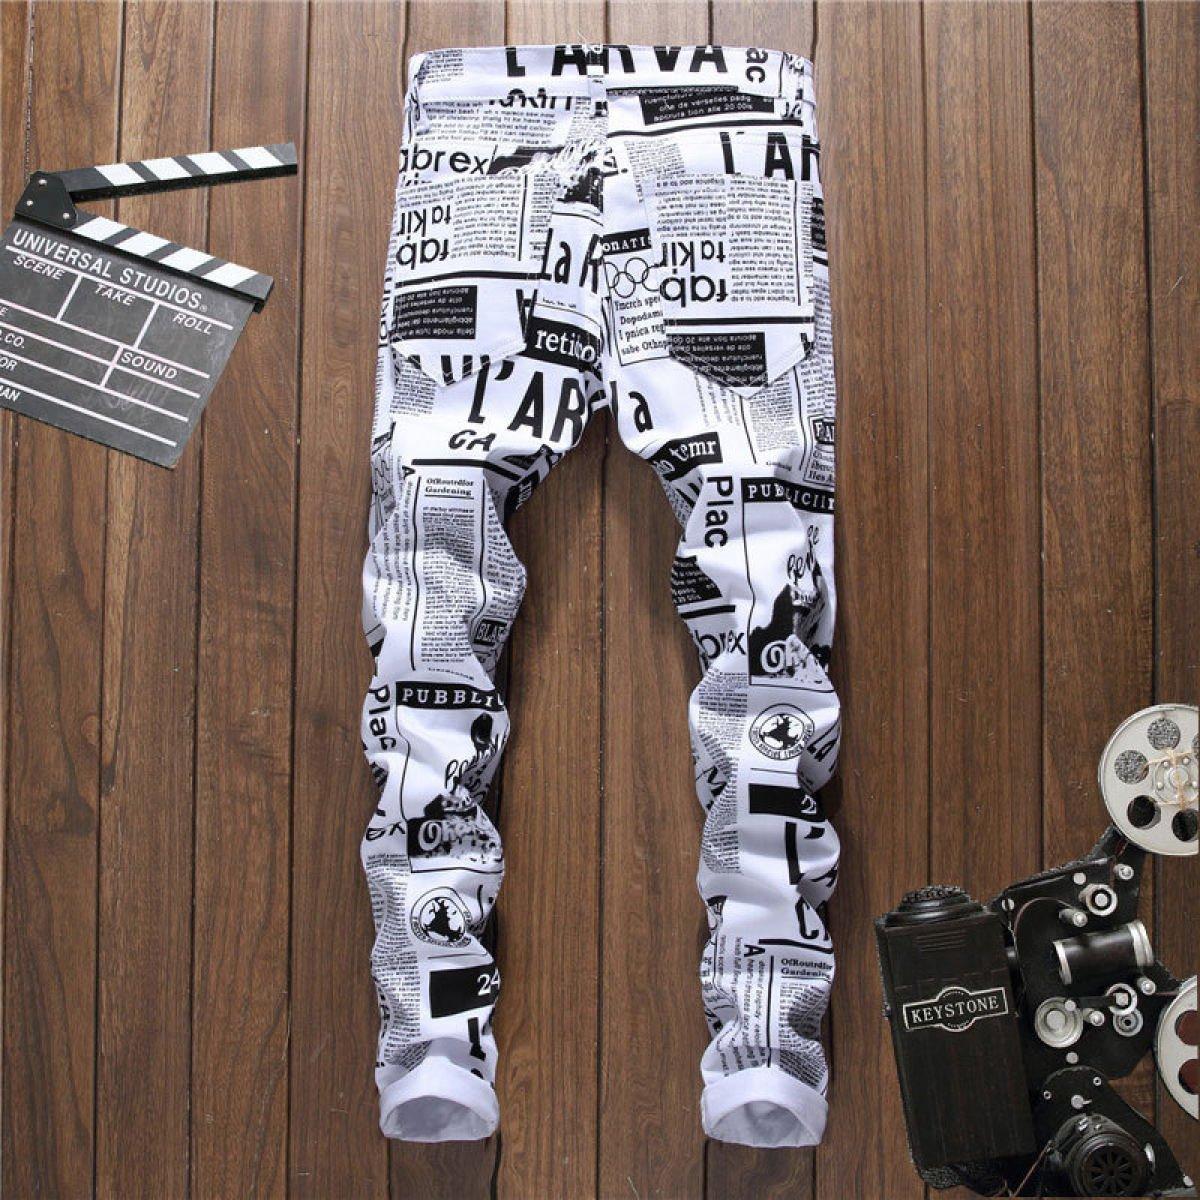 75bab3cd4e2d CHFYI Männer Mittlere Taille Gerade Bestickte Jeans Slim Fit Stretch  Painting Jeans  Amazon.de  Bekleidung